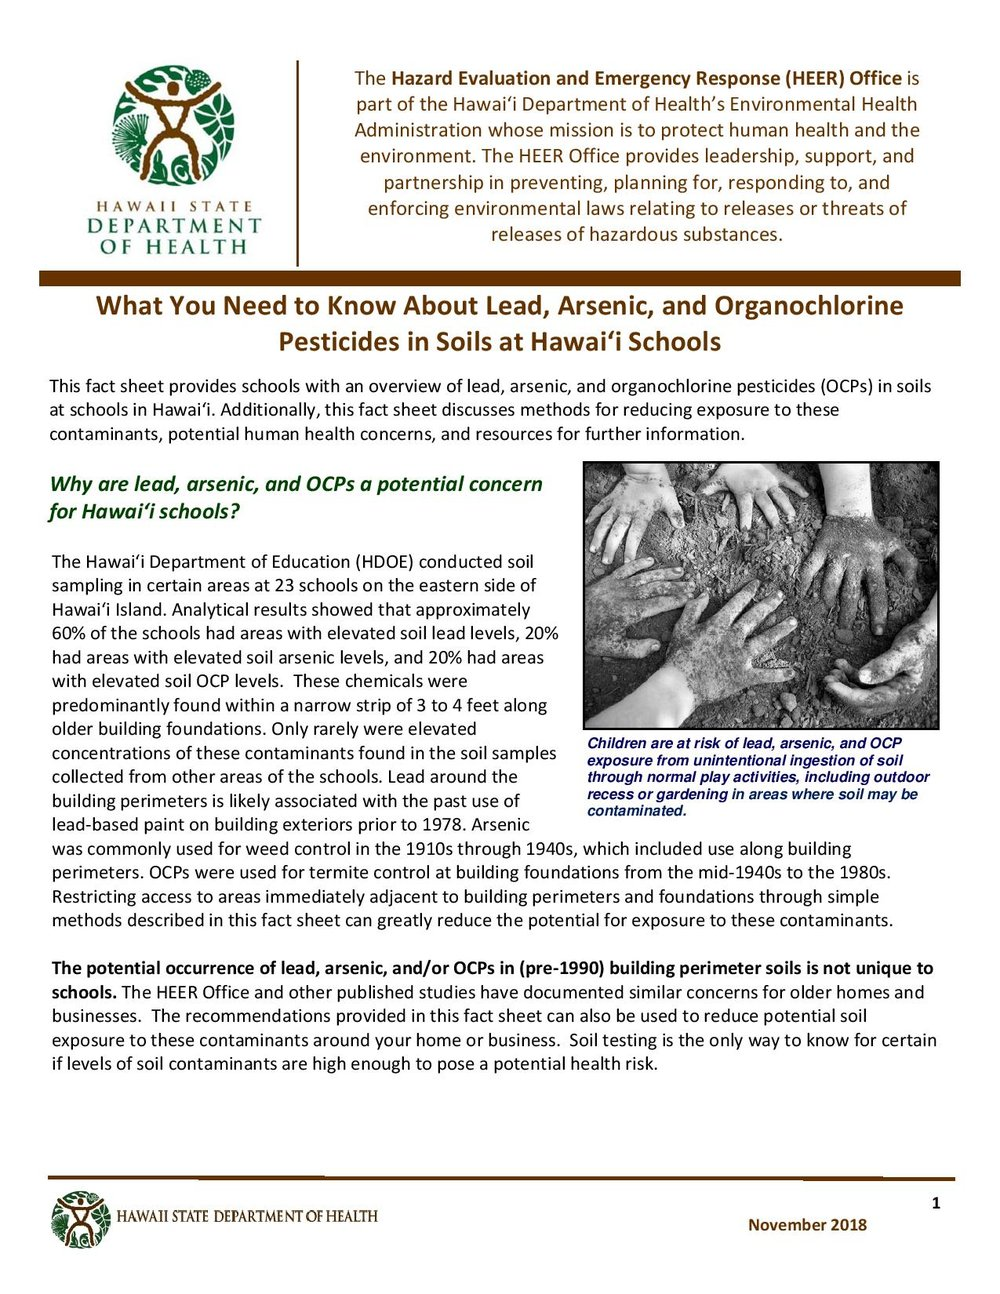 Contaminated Soils Schools Fact Sheet-page-001.jpg